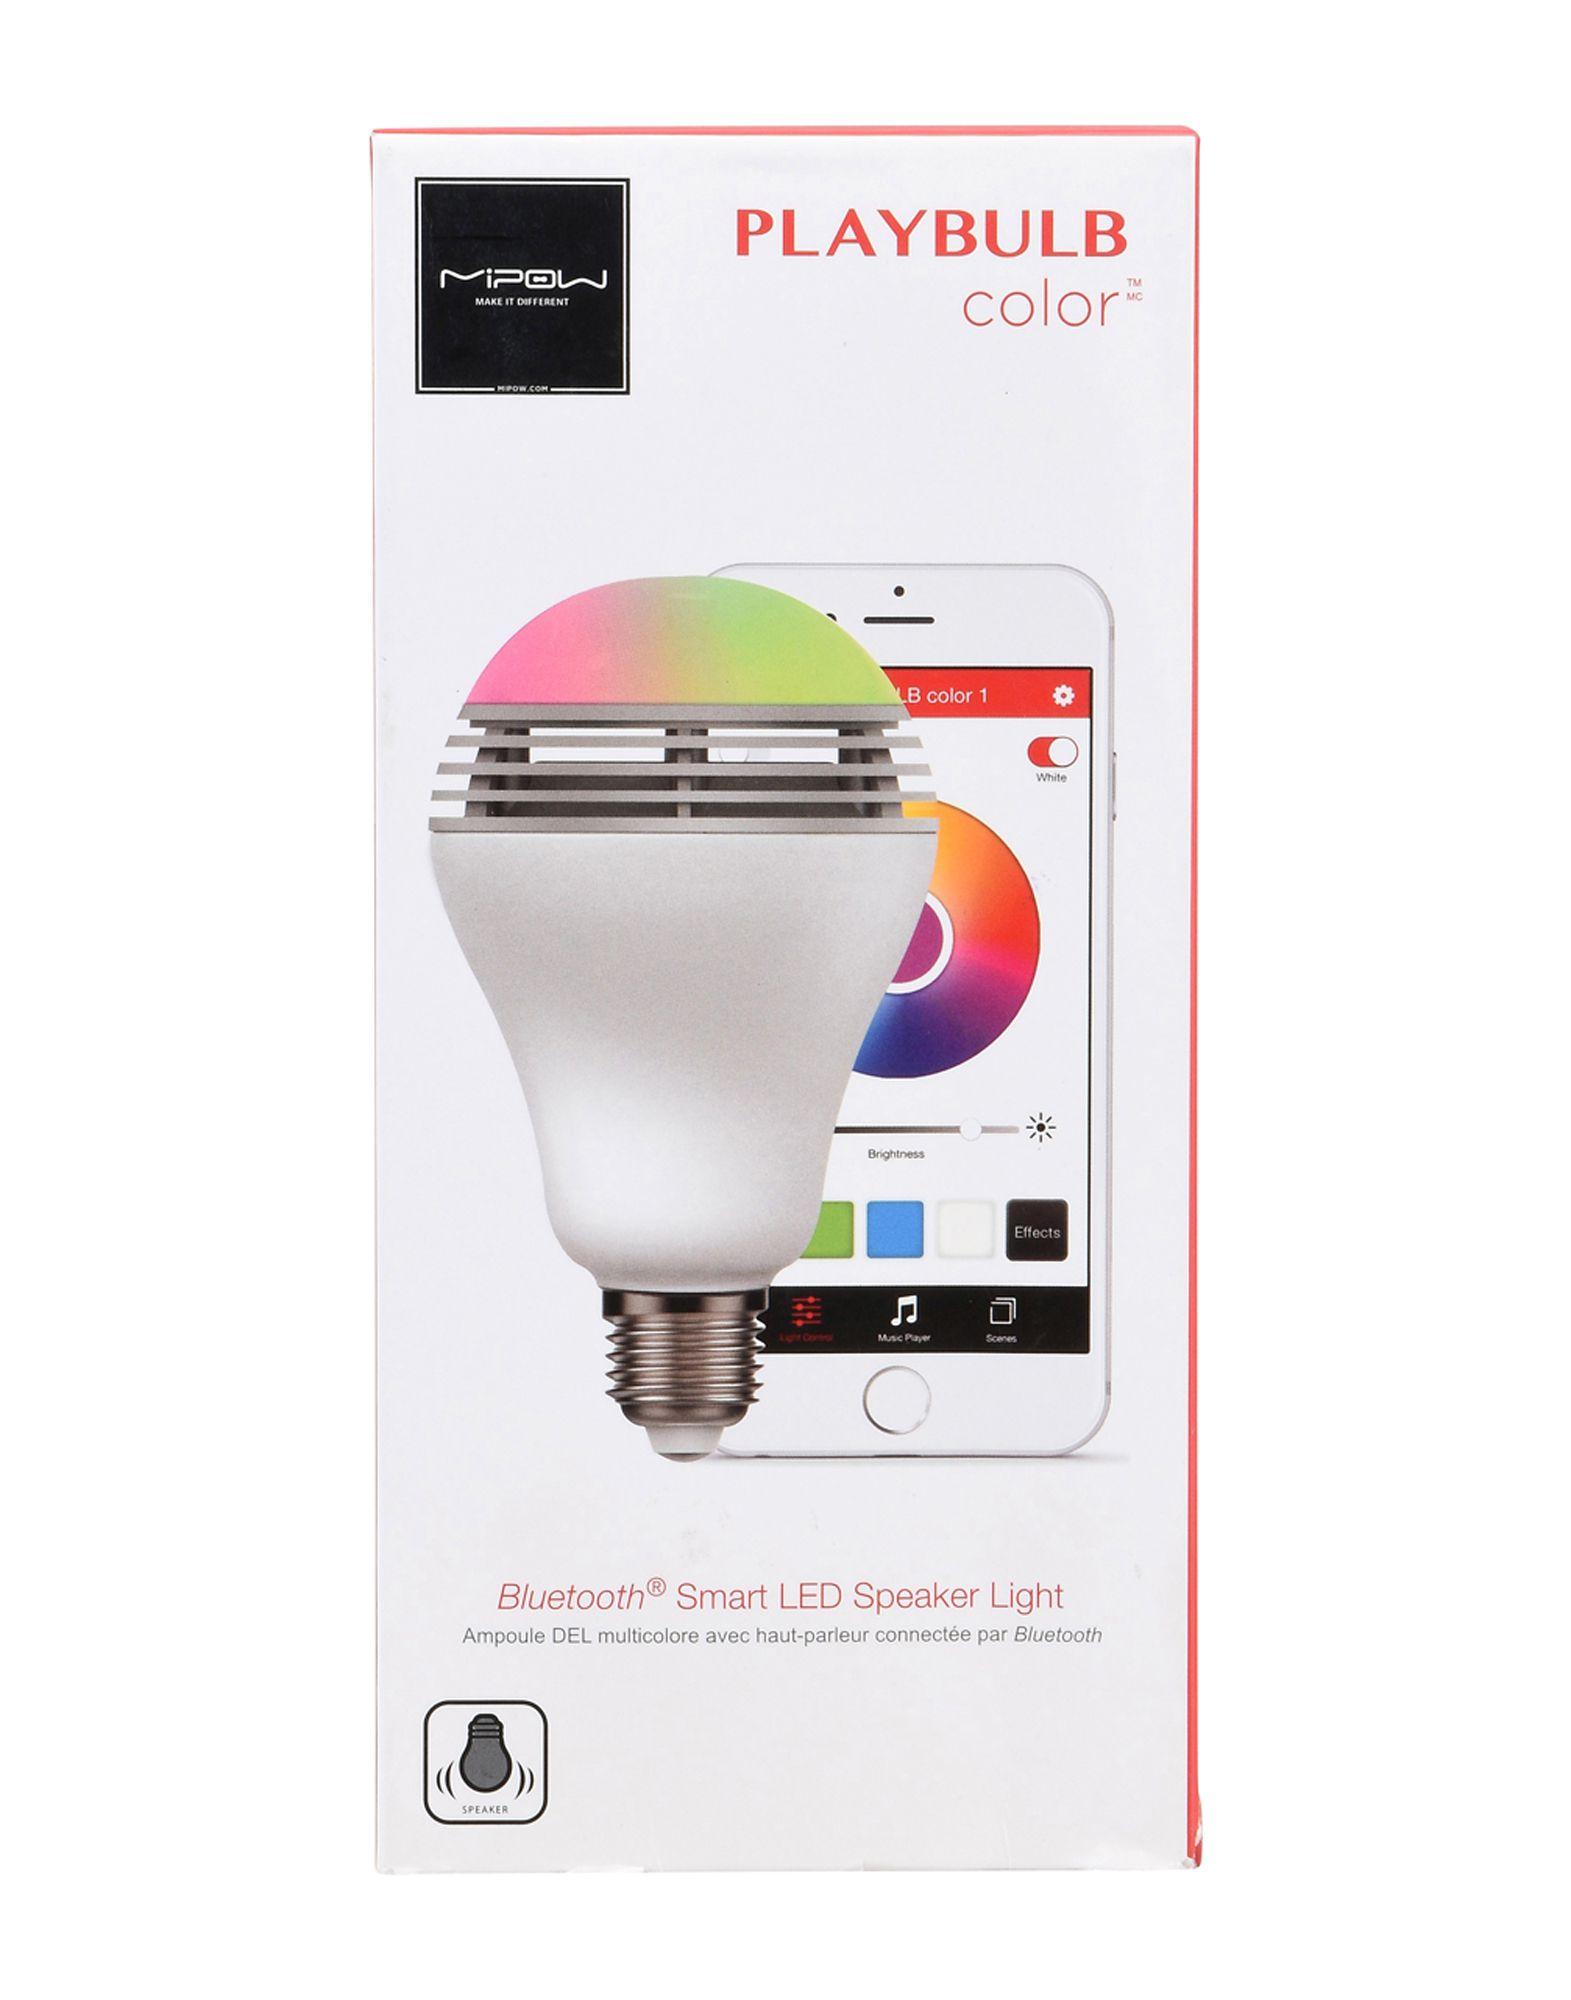 Accessorio Hi-Tech Mipow Bluetooth 4.0 Device,Rgb Color Light Bulb With Bluetooth Speaker And App Control - Uomo - Acquista online su